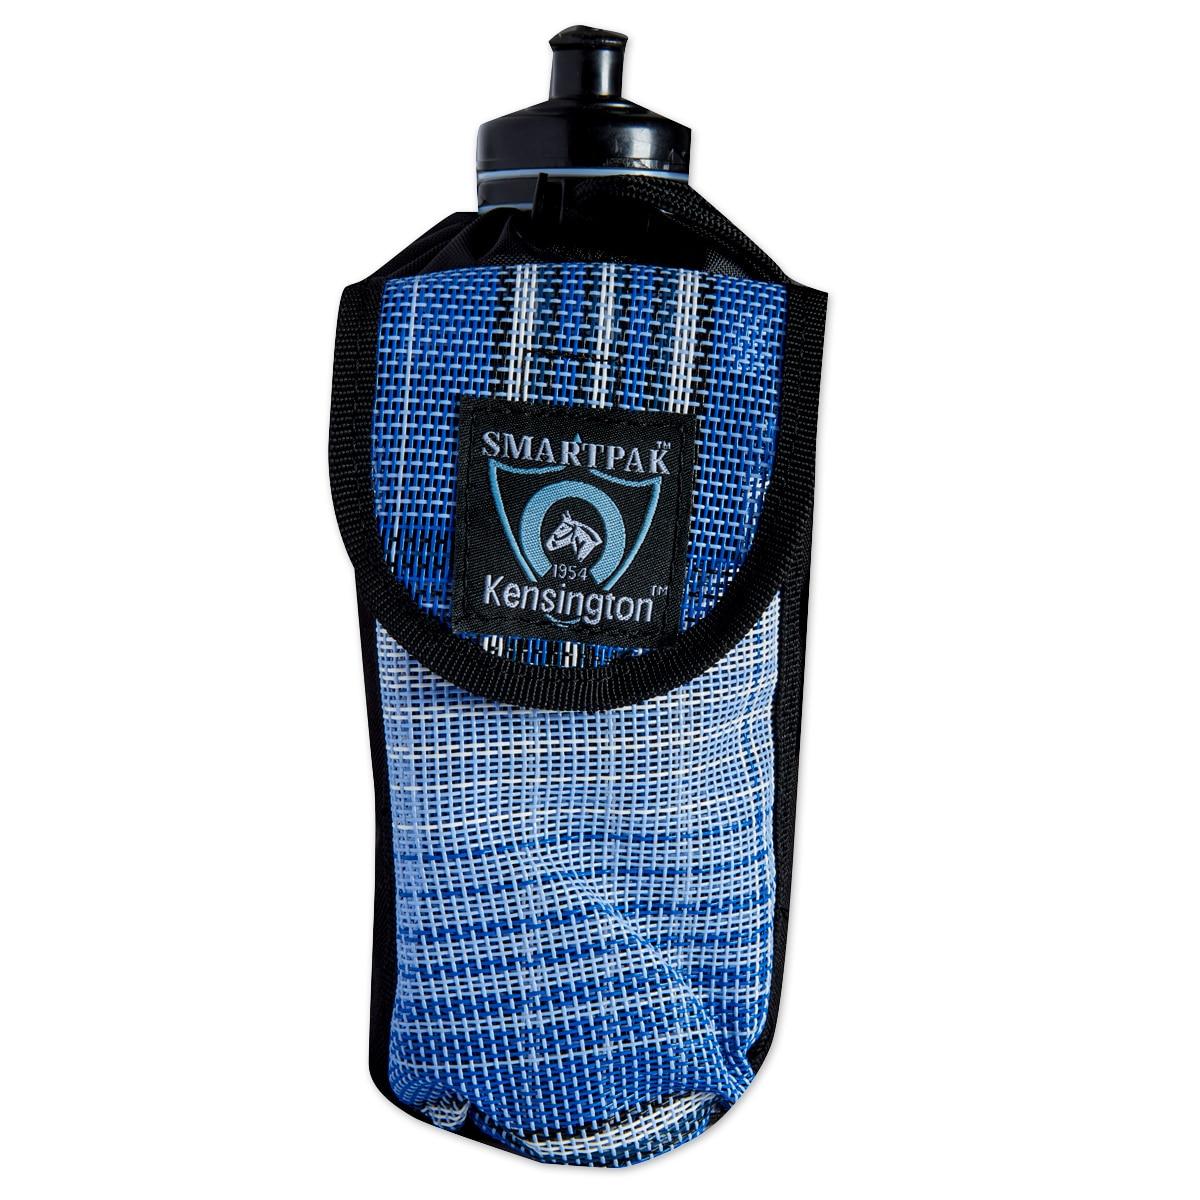 Kensington All Around Insulated Single Water Bottle Holder